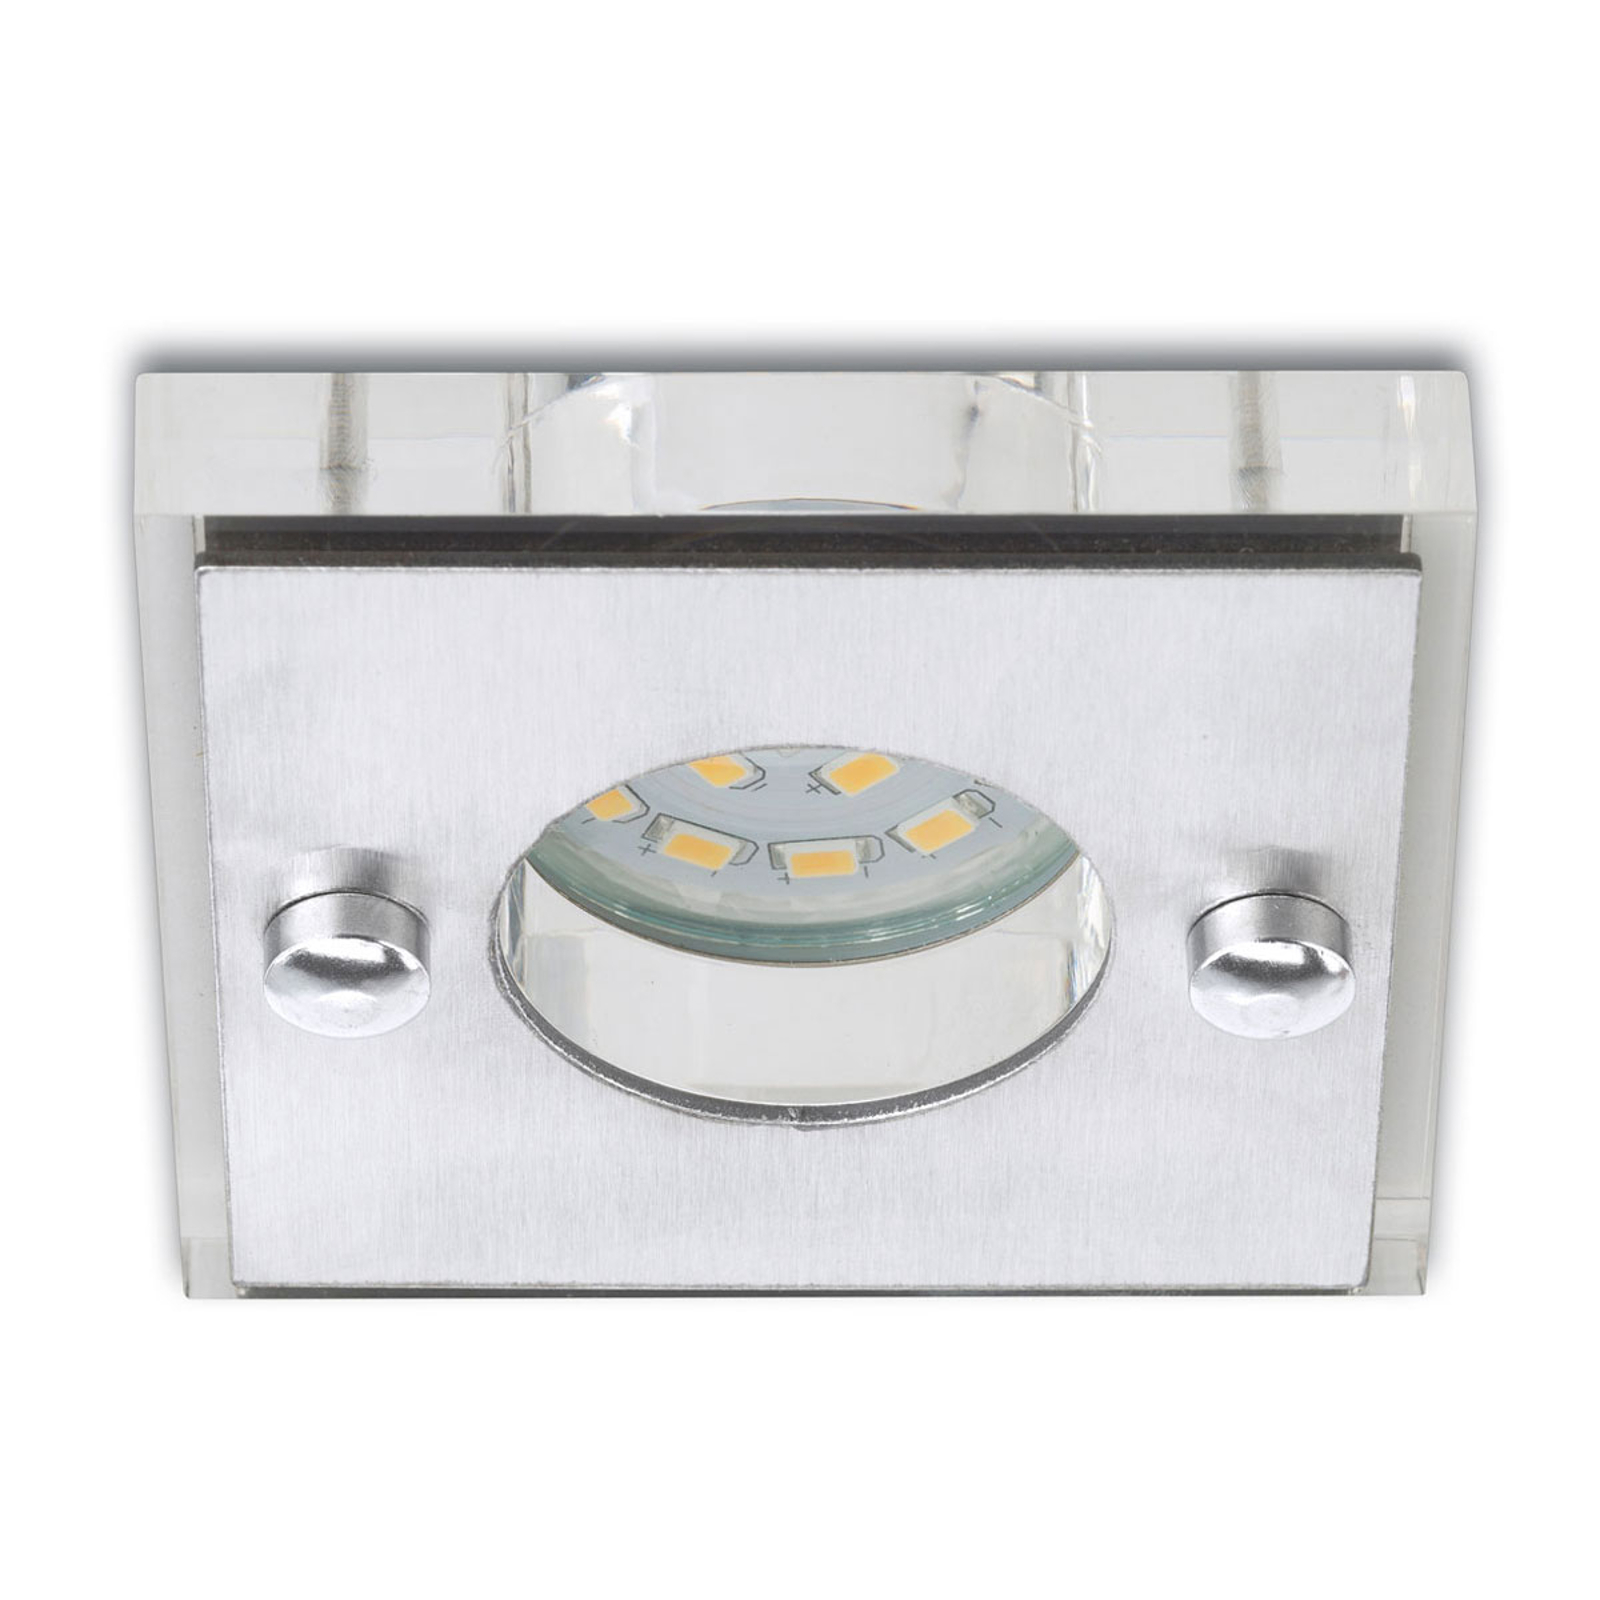 Square - LED recessed light Nikas, matt nickel_1510271_1